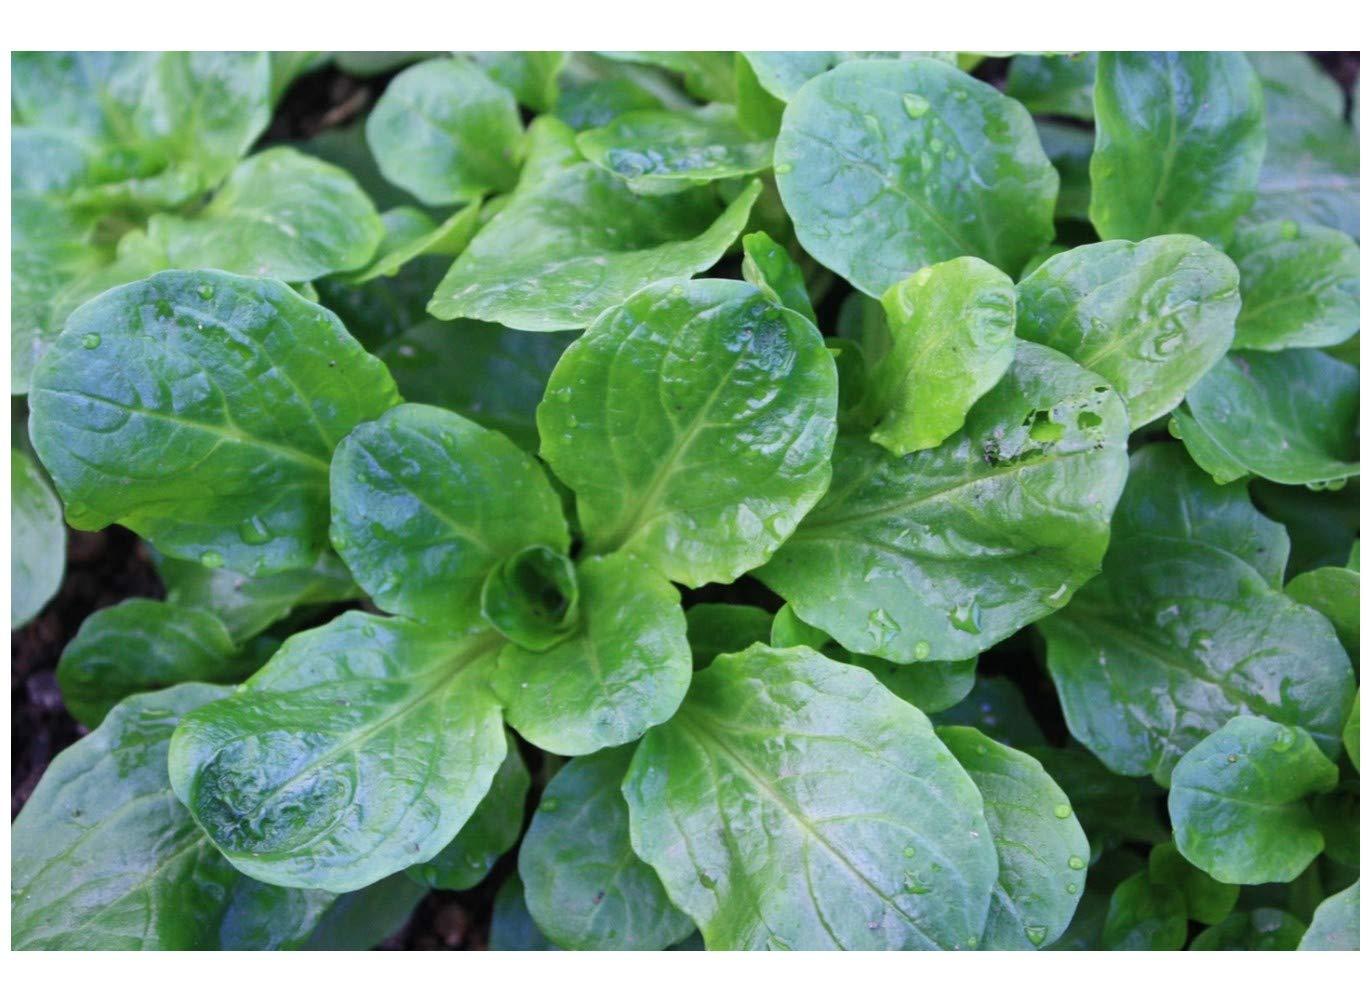 Corn Salad - Lambs Lettuce - Mache - 1300 Finest Seeds Premier Seeds Direct HRB14